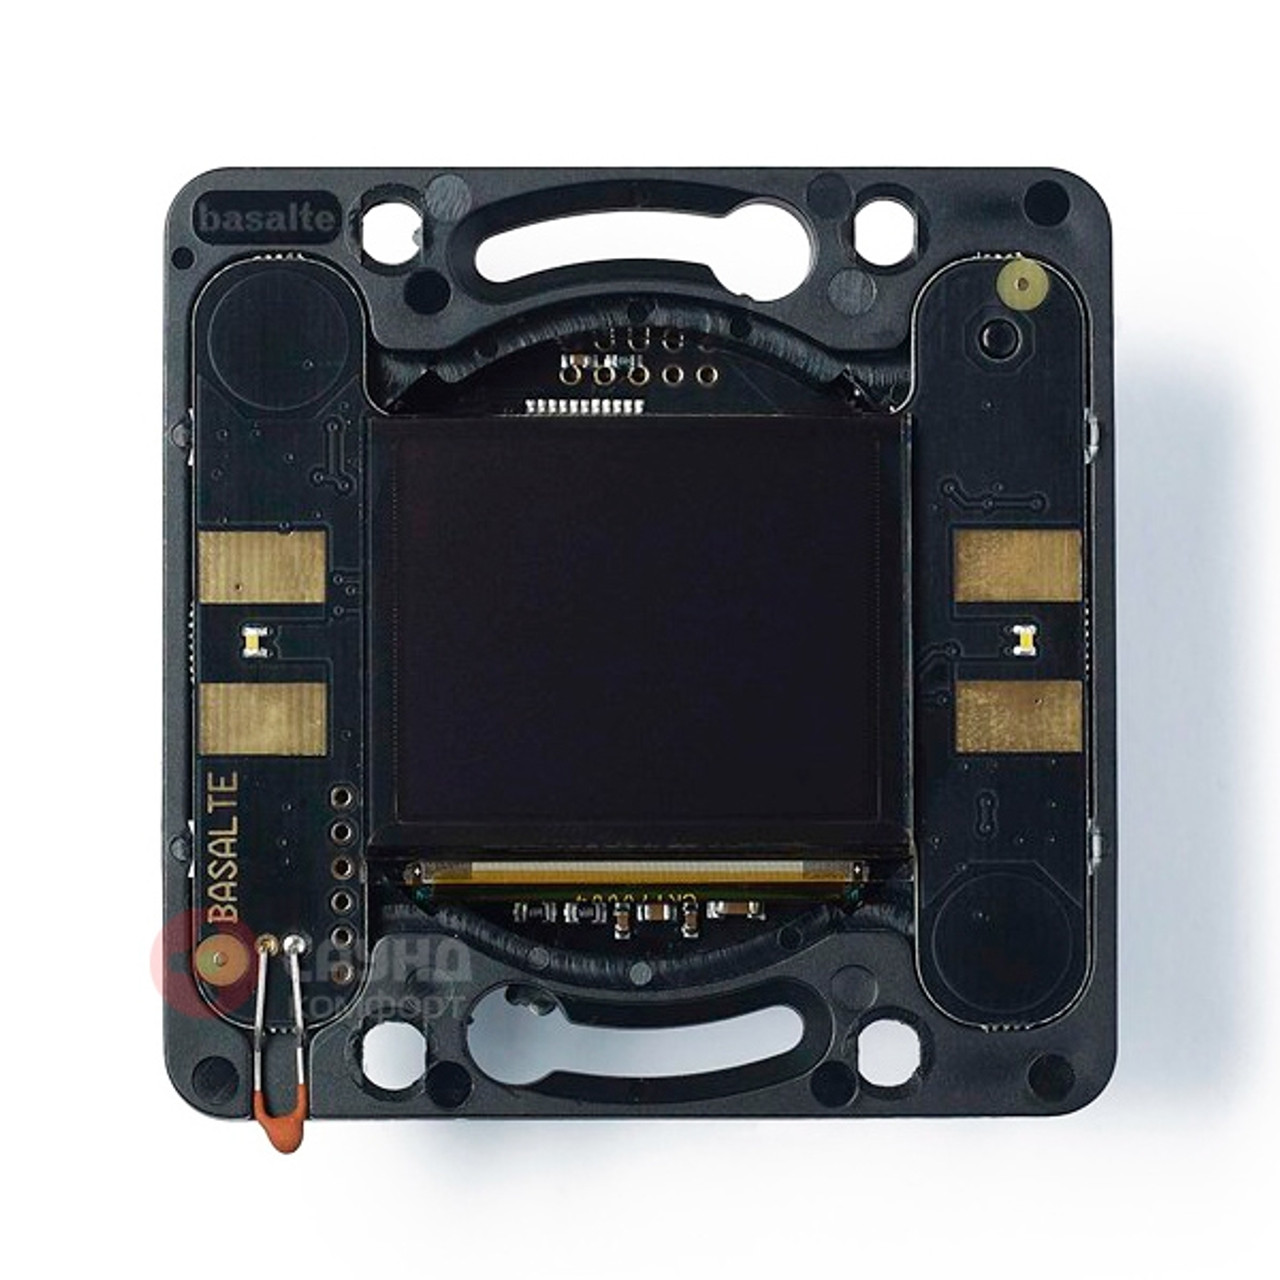 Deseo electronics - KNX/EIB